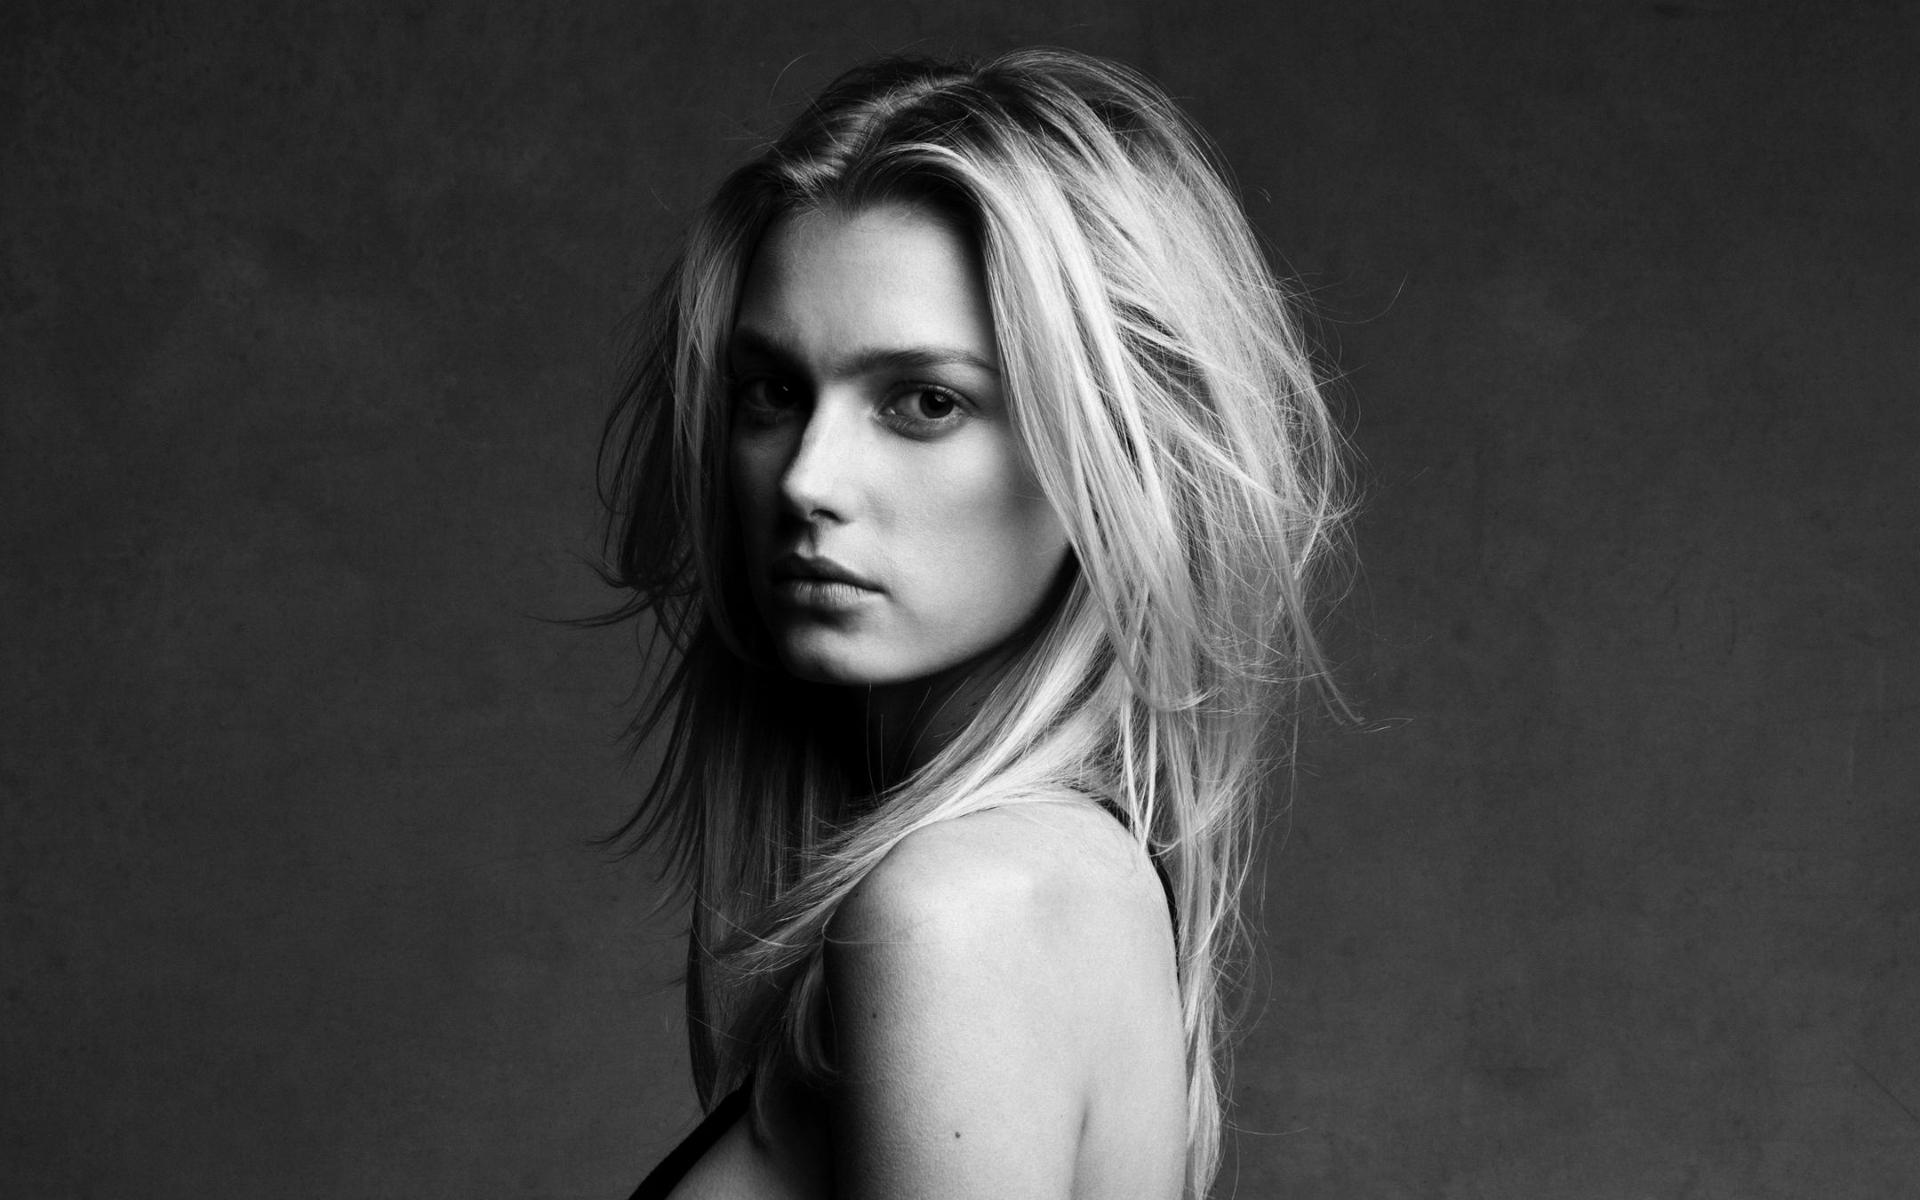 Sigrid Agren Nude Photos 4